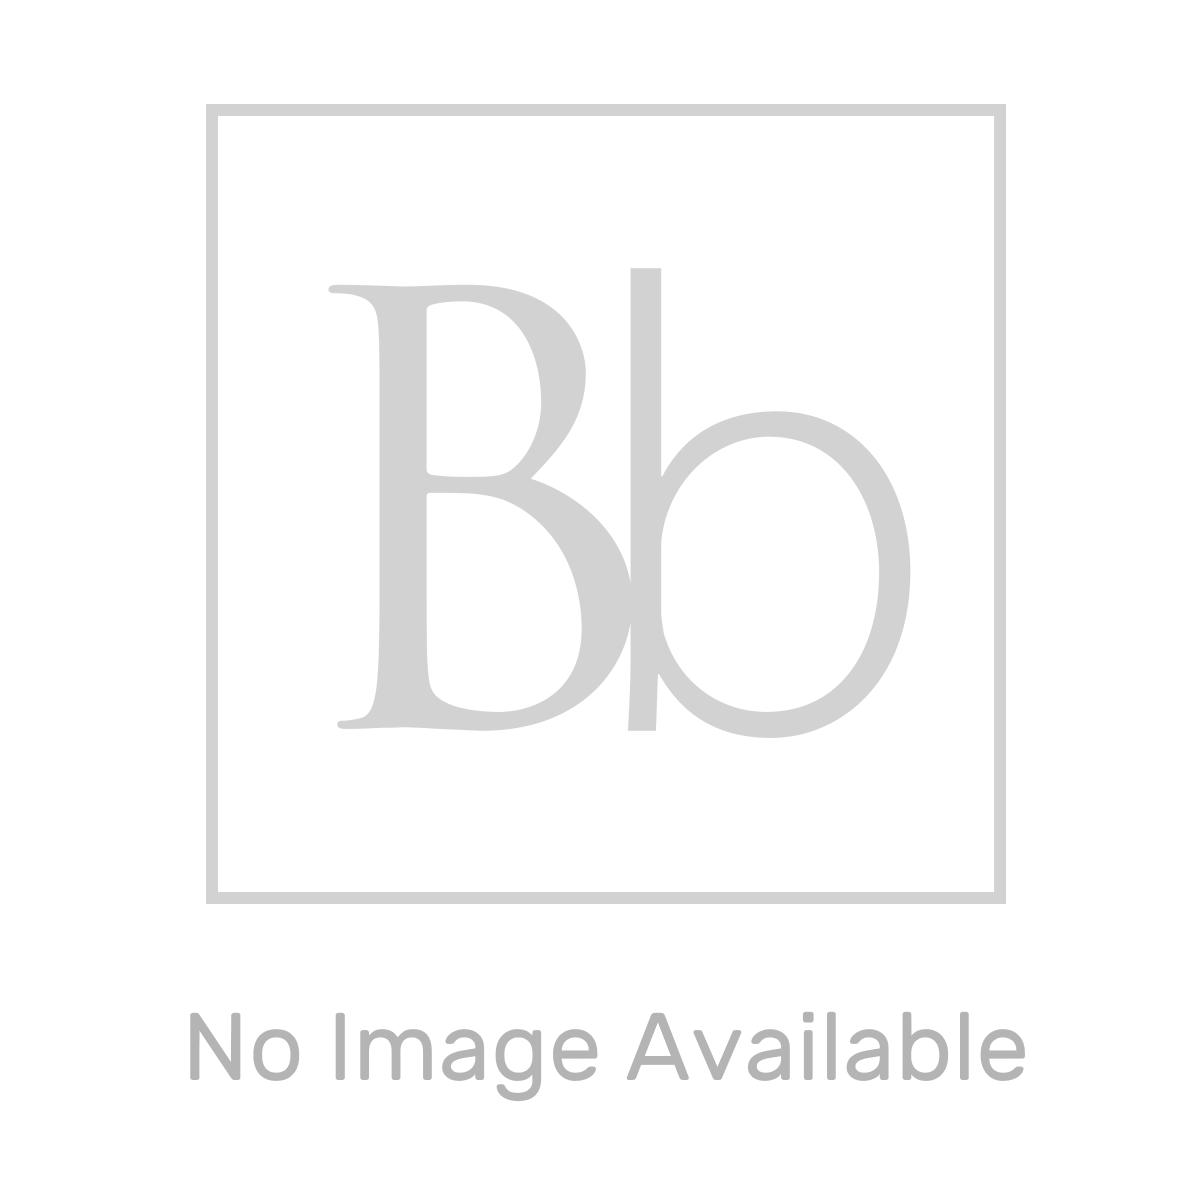 RAK Moon Black Ceramic Soap Dispenser Measurements